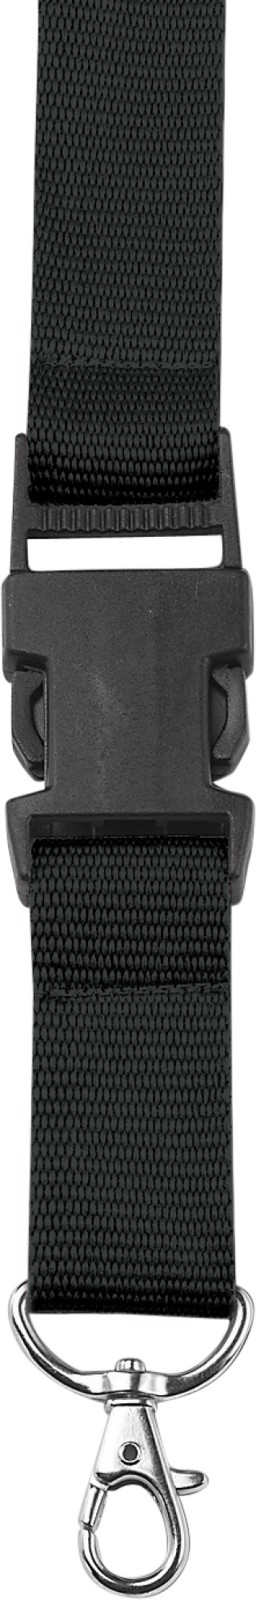 Polyester (300D) lanyard and key holder - Black